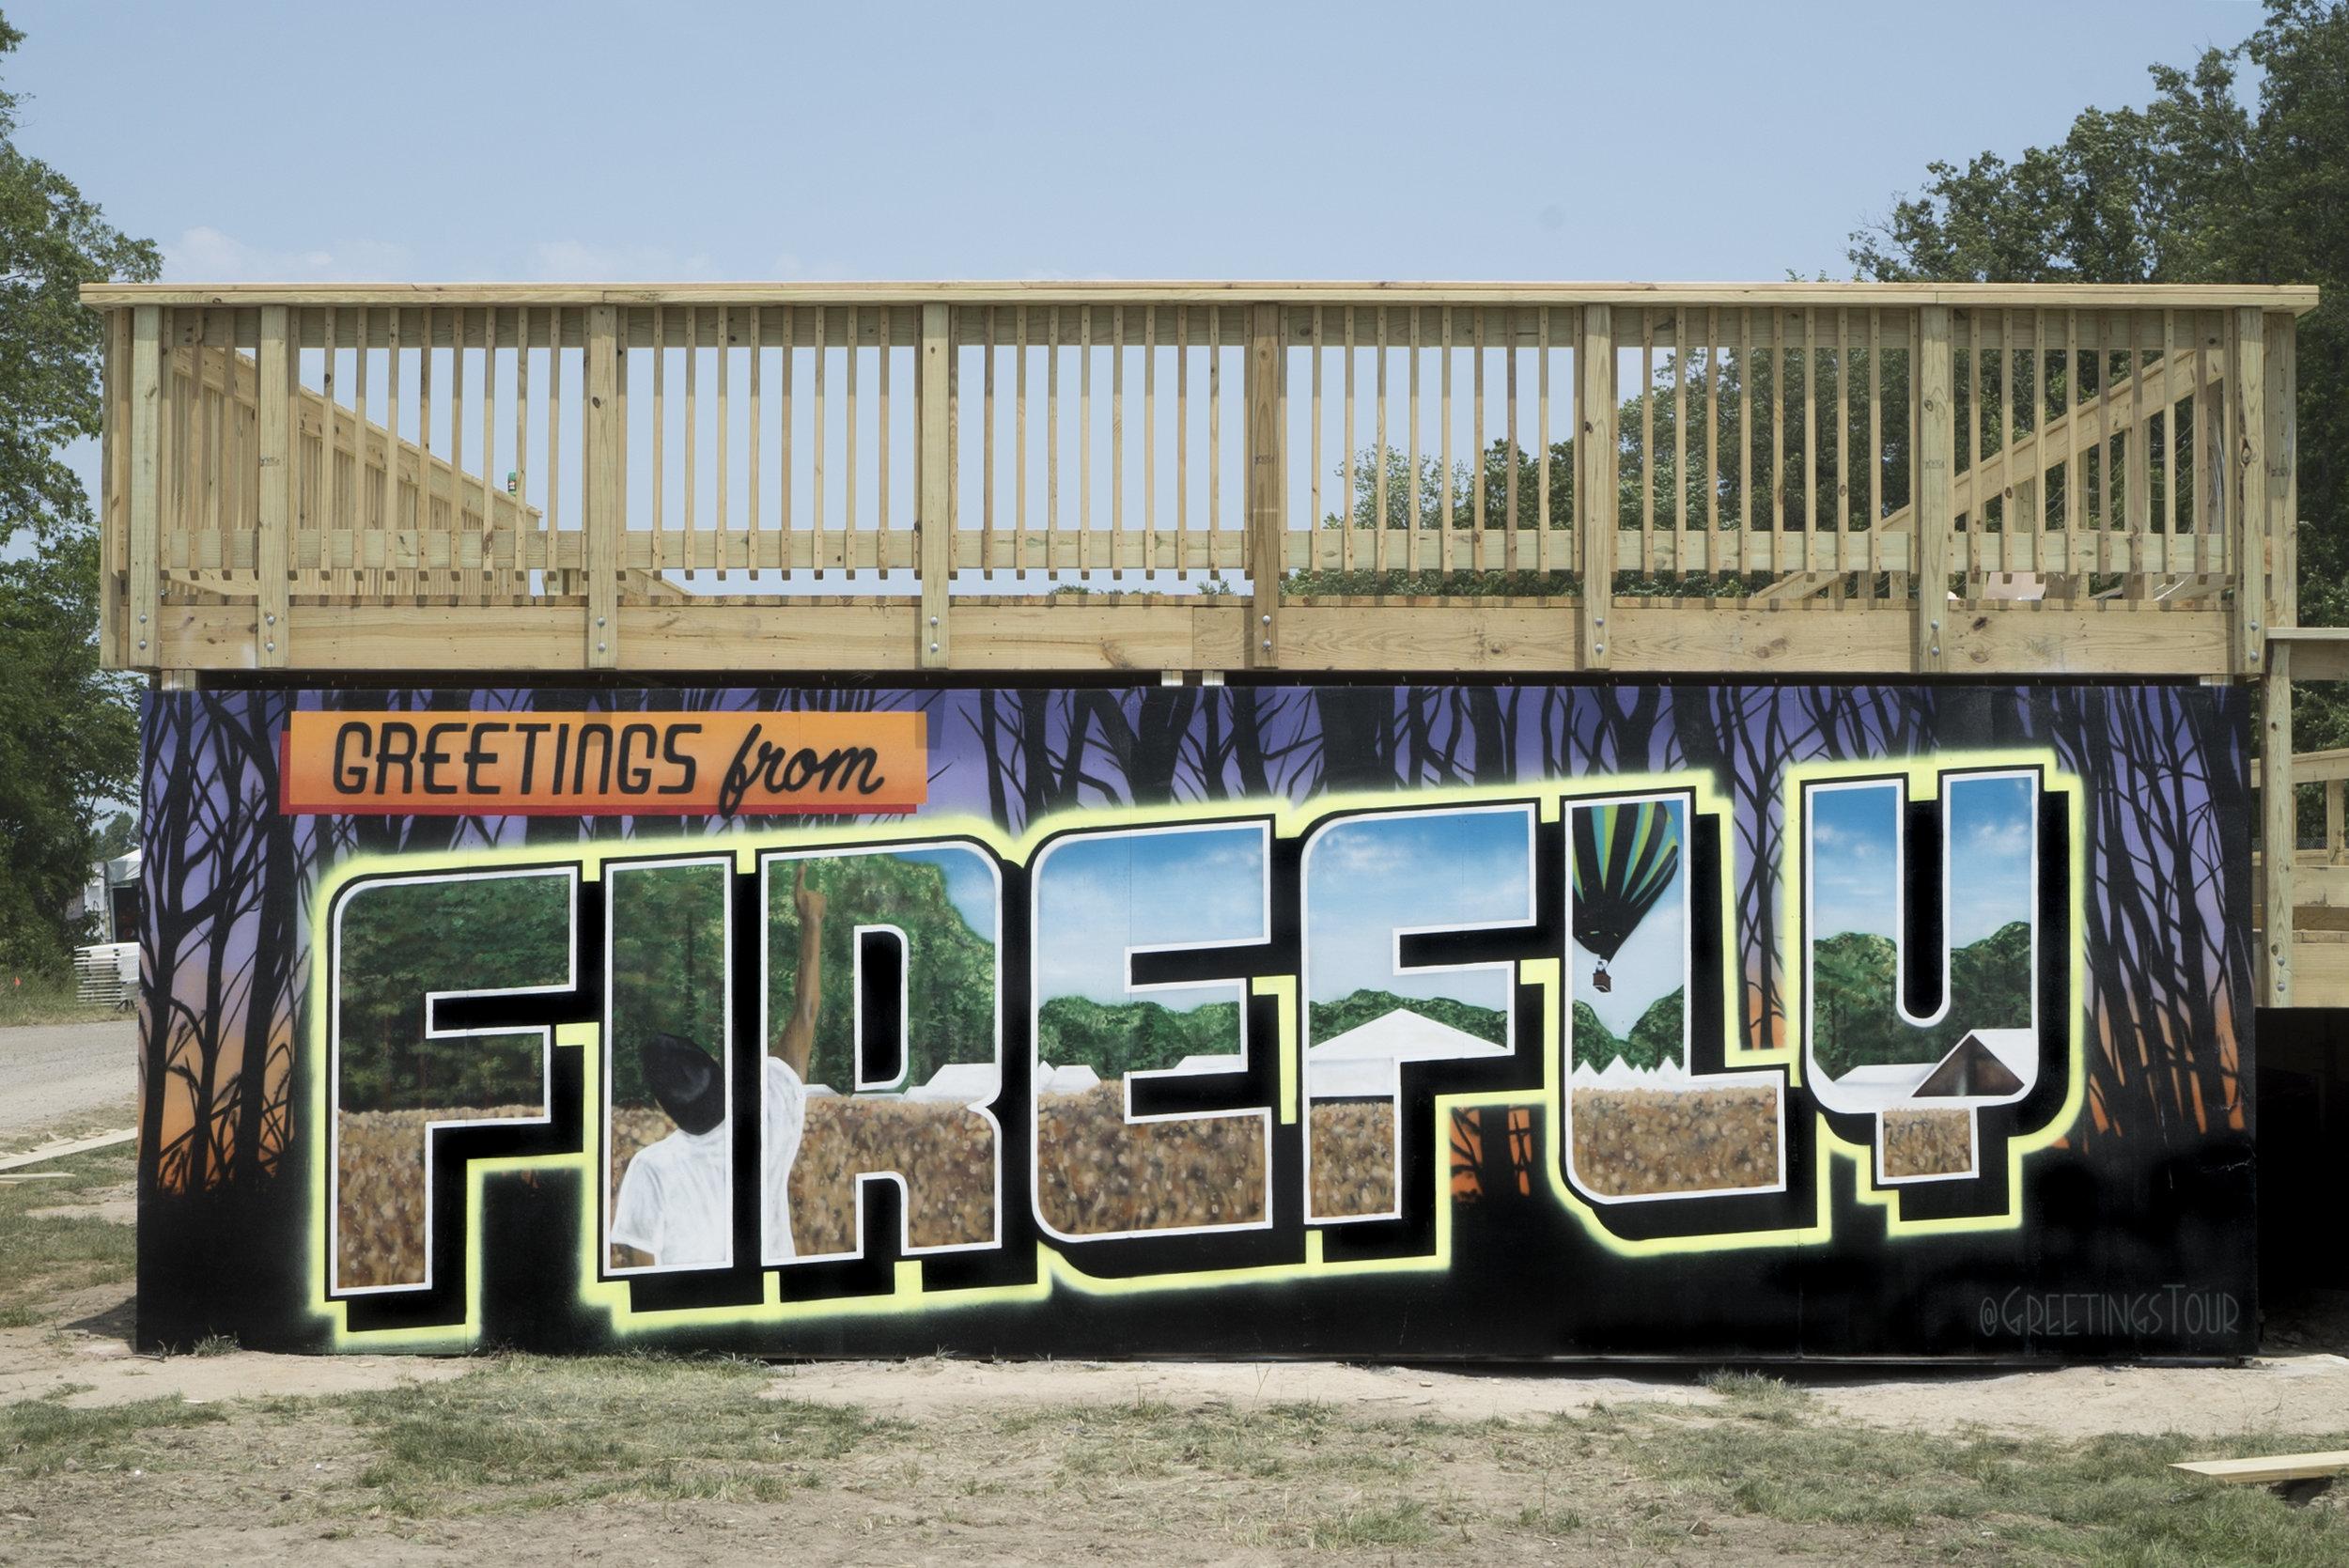 FIREFLY_001.jpg